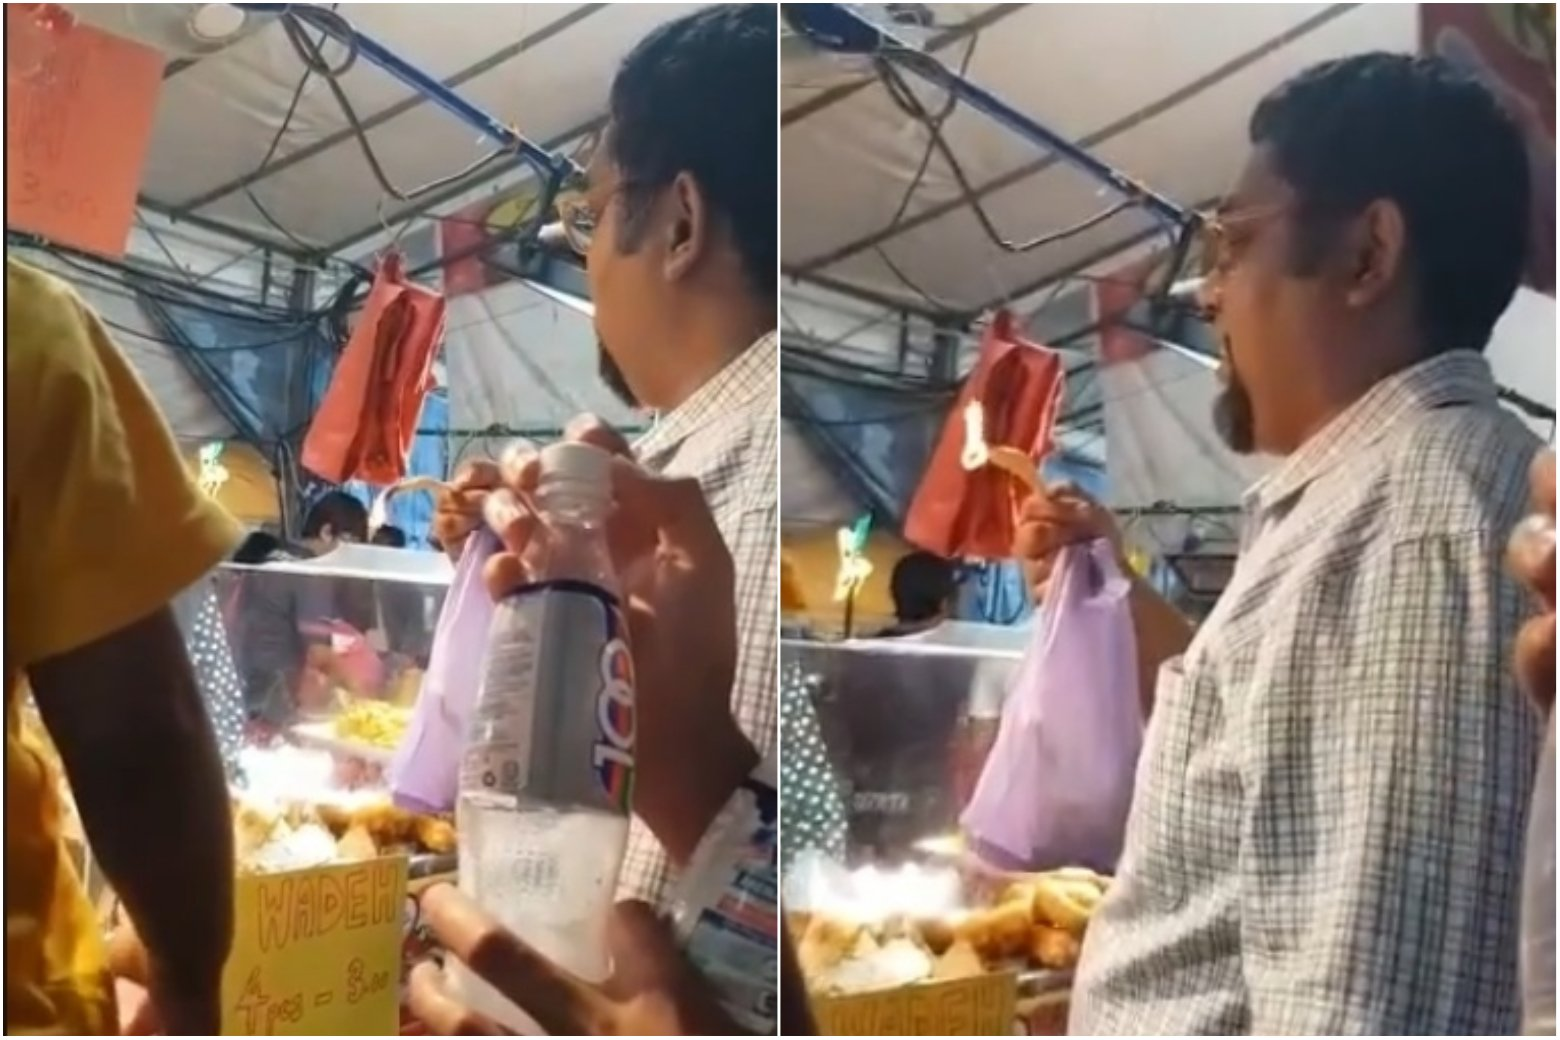 Claims of 'plastic' keropok being sold at Hari Raya Bazaar false: AVA https://t.co/vkU1XeWKQz https://t.co/mG0azc5iGy